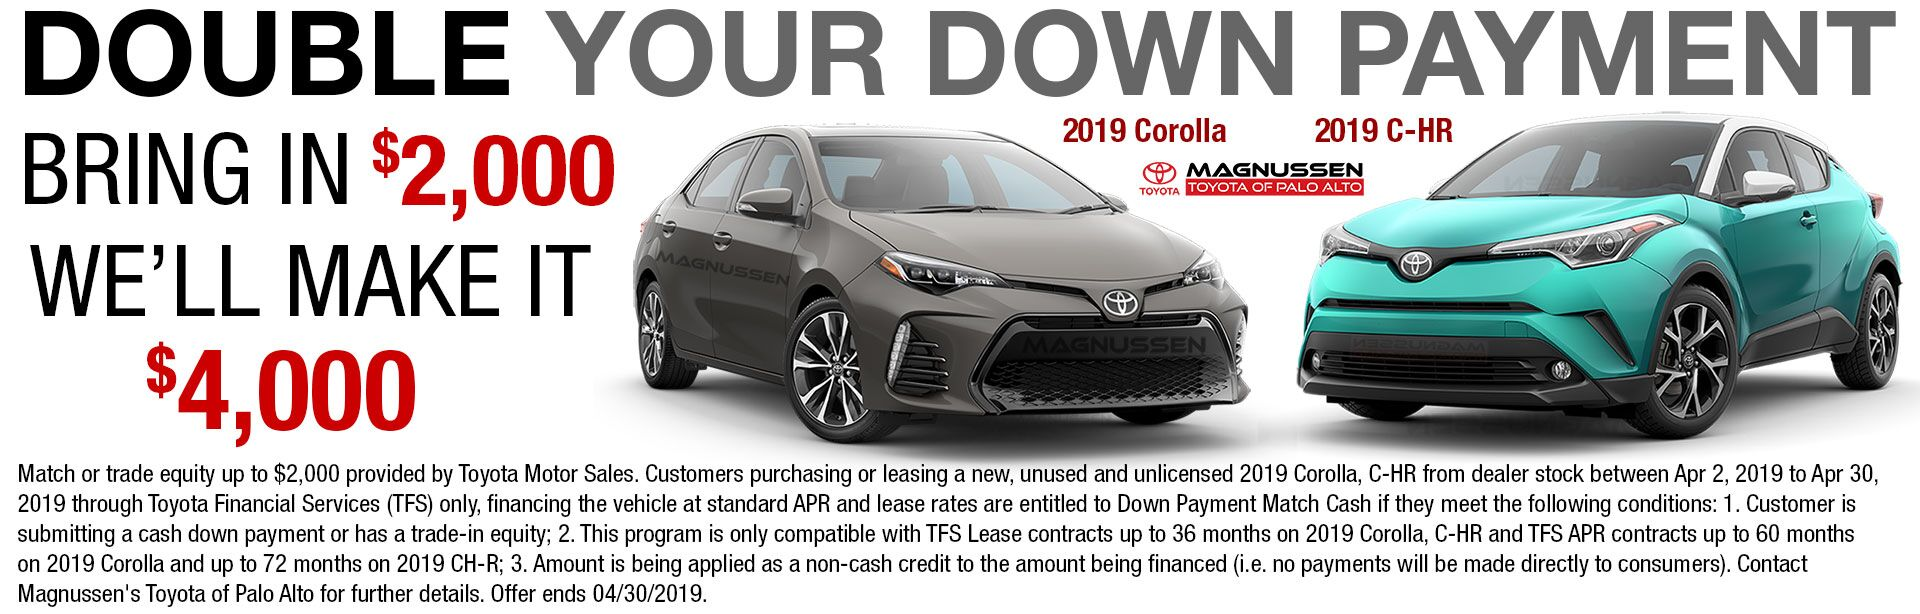 Magnussens Toyota Of Palo Alto 866 756 1148 Dealer Serving Sunnyvale Menlo Park California Ca